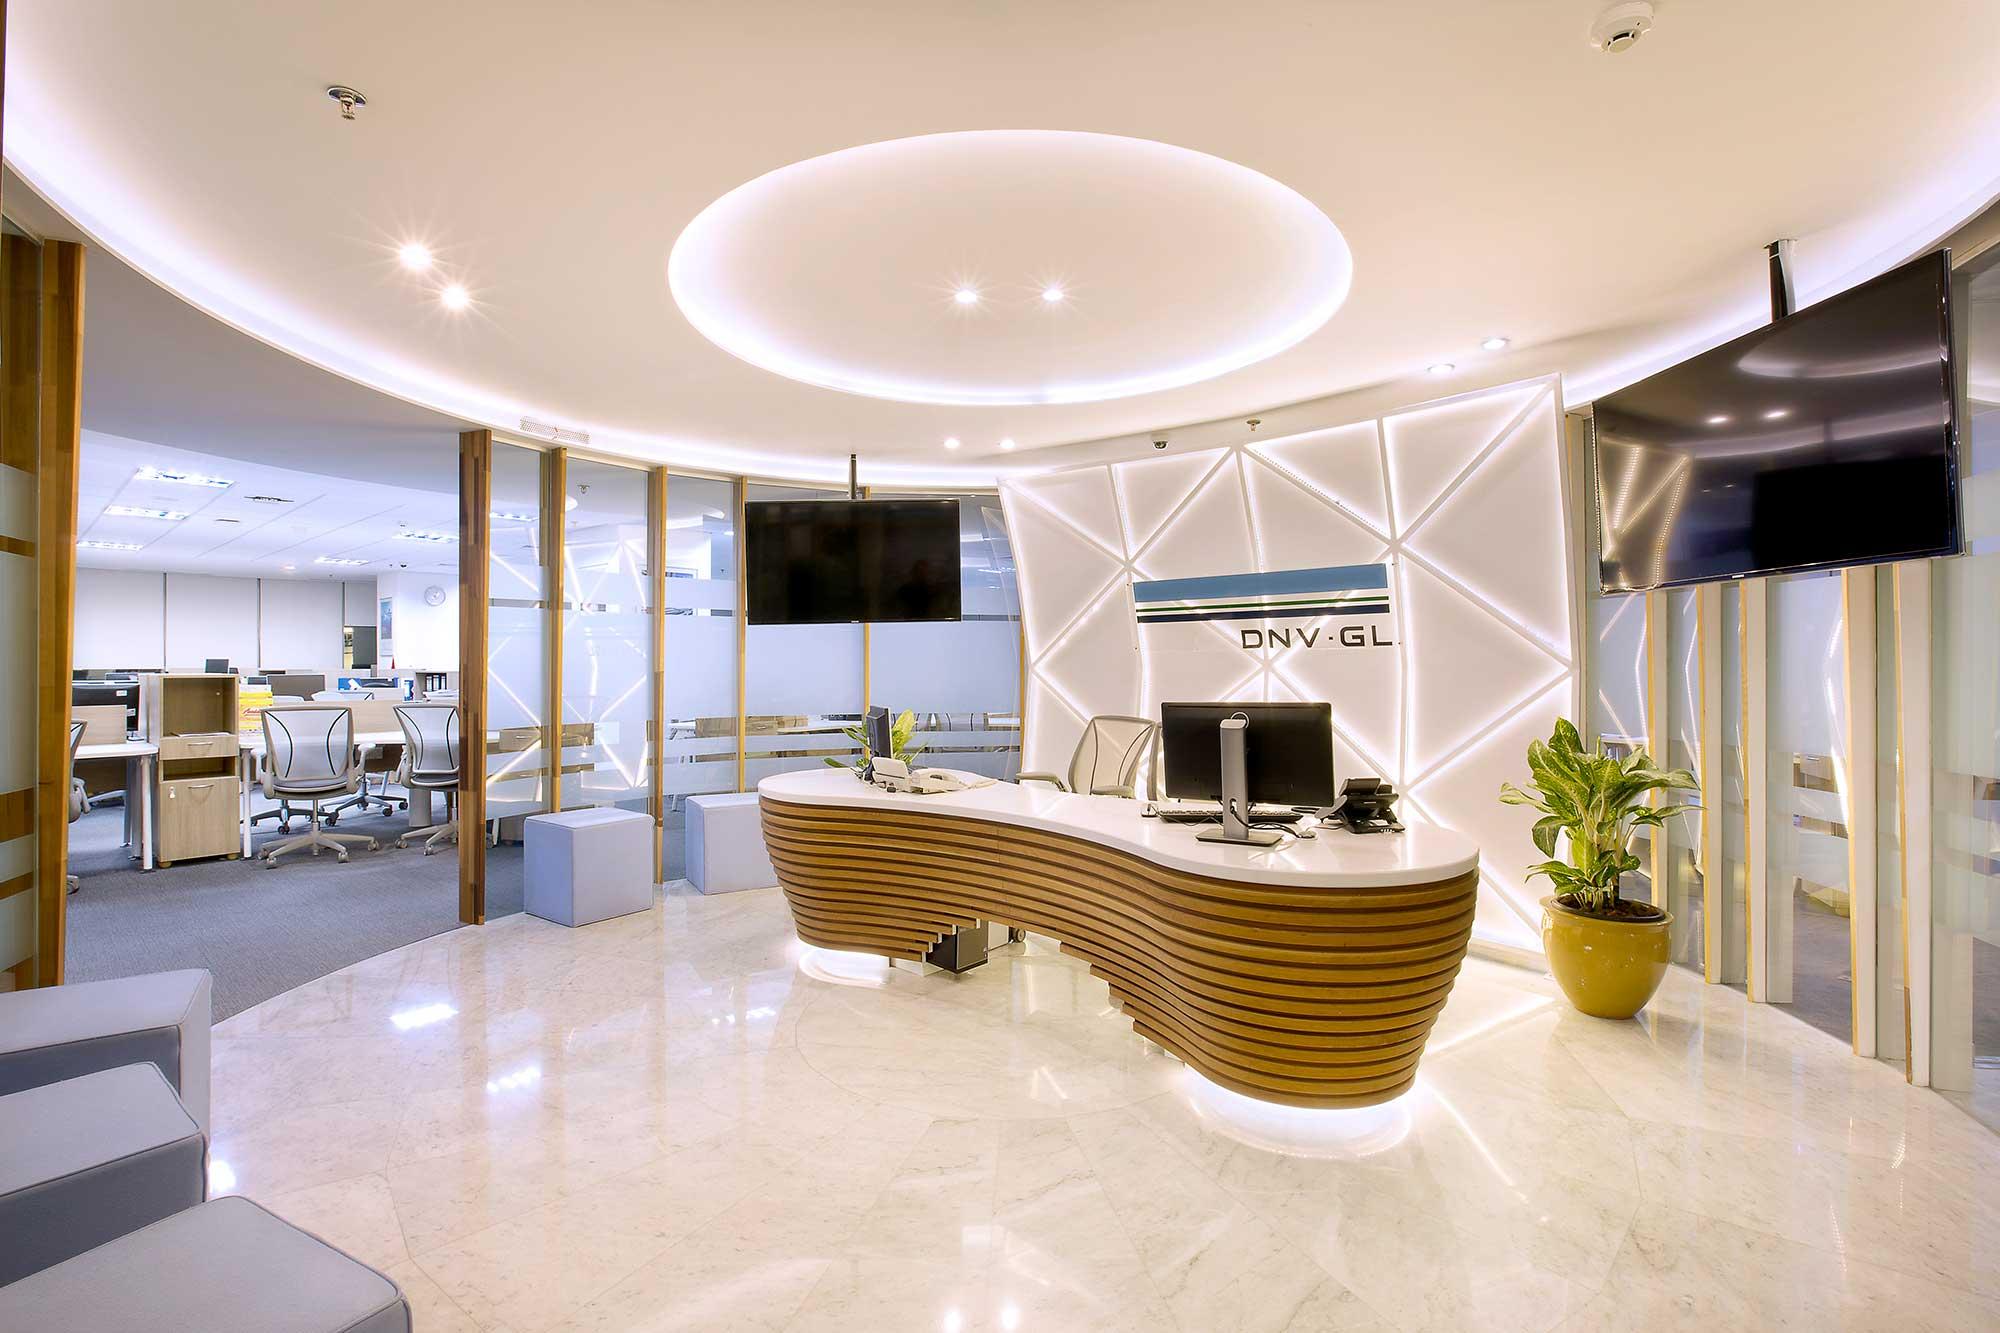 The new reception area for Noble Denton. Interior Design + Build by AVIP.